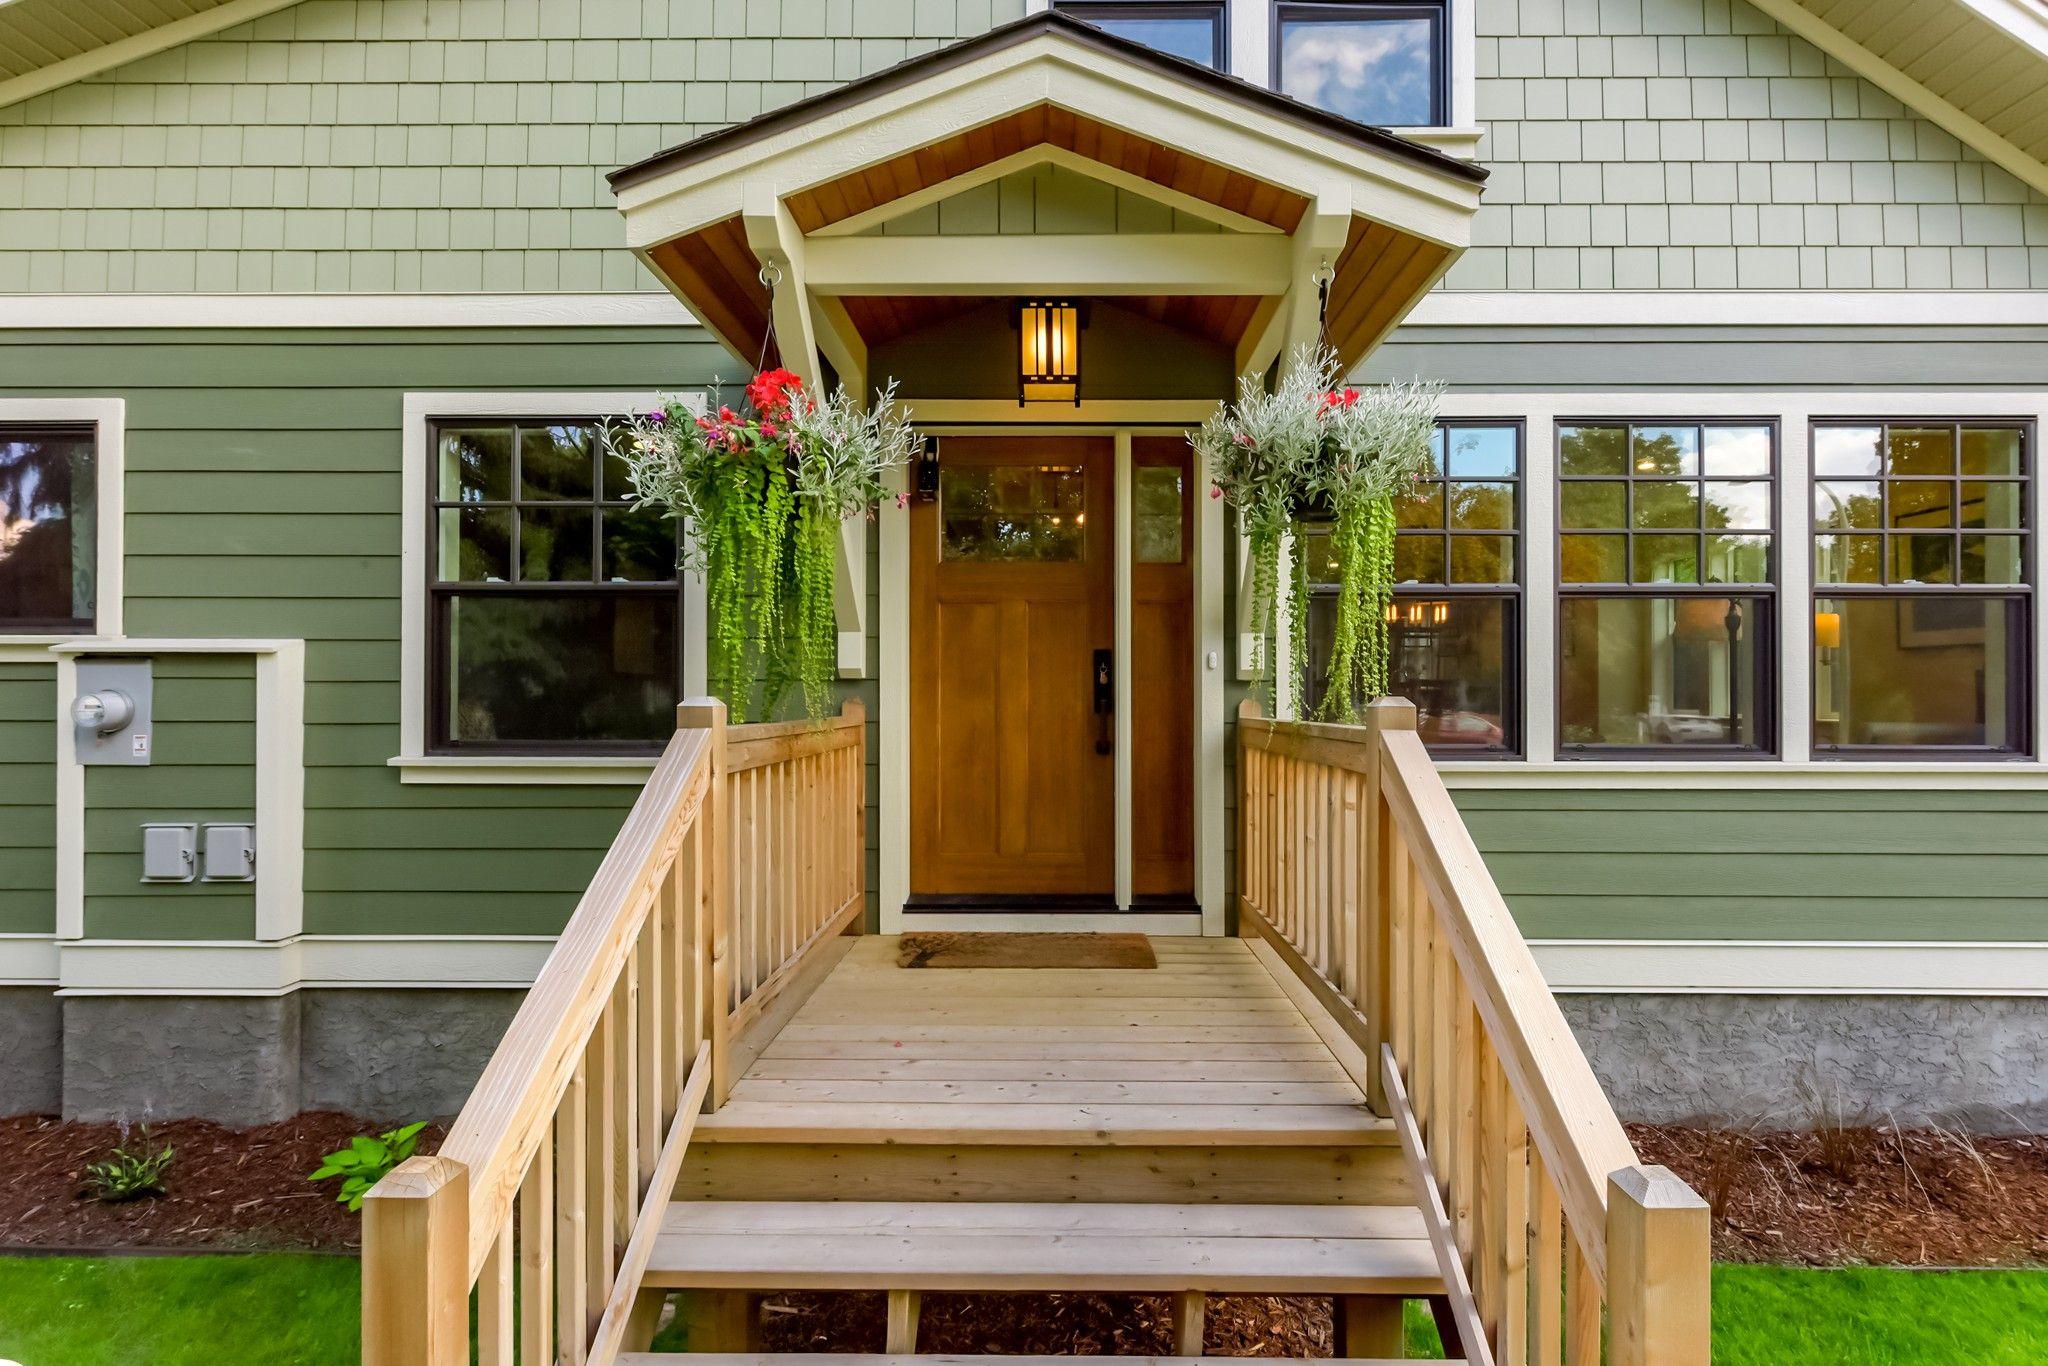 Main Photo: 953 Laurier Avenue in Kelowna: Kelowna South House for sale (Central Okanagan)  : MLS®# 10213796